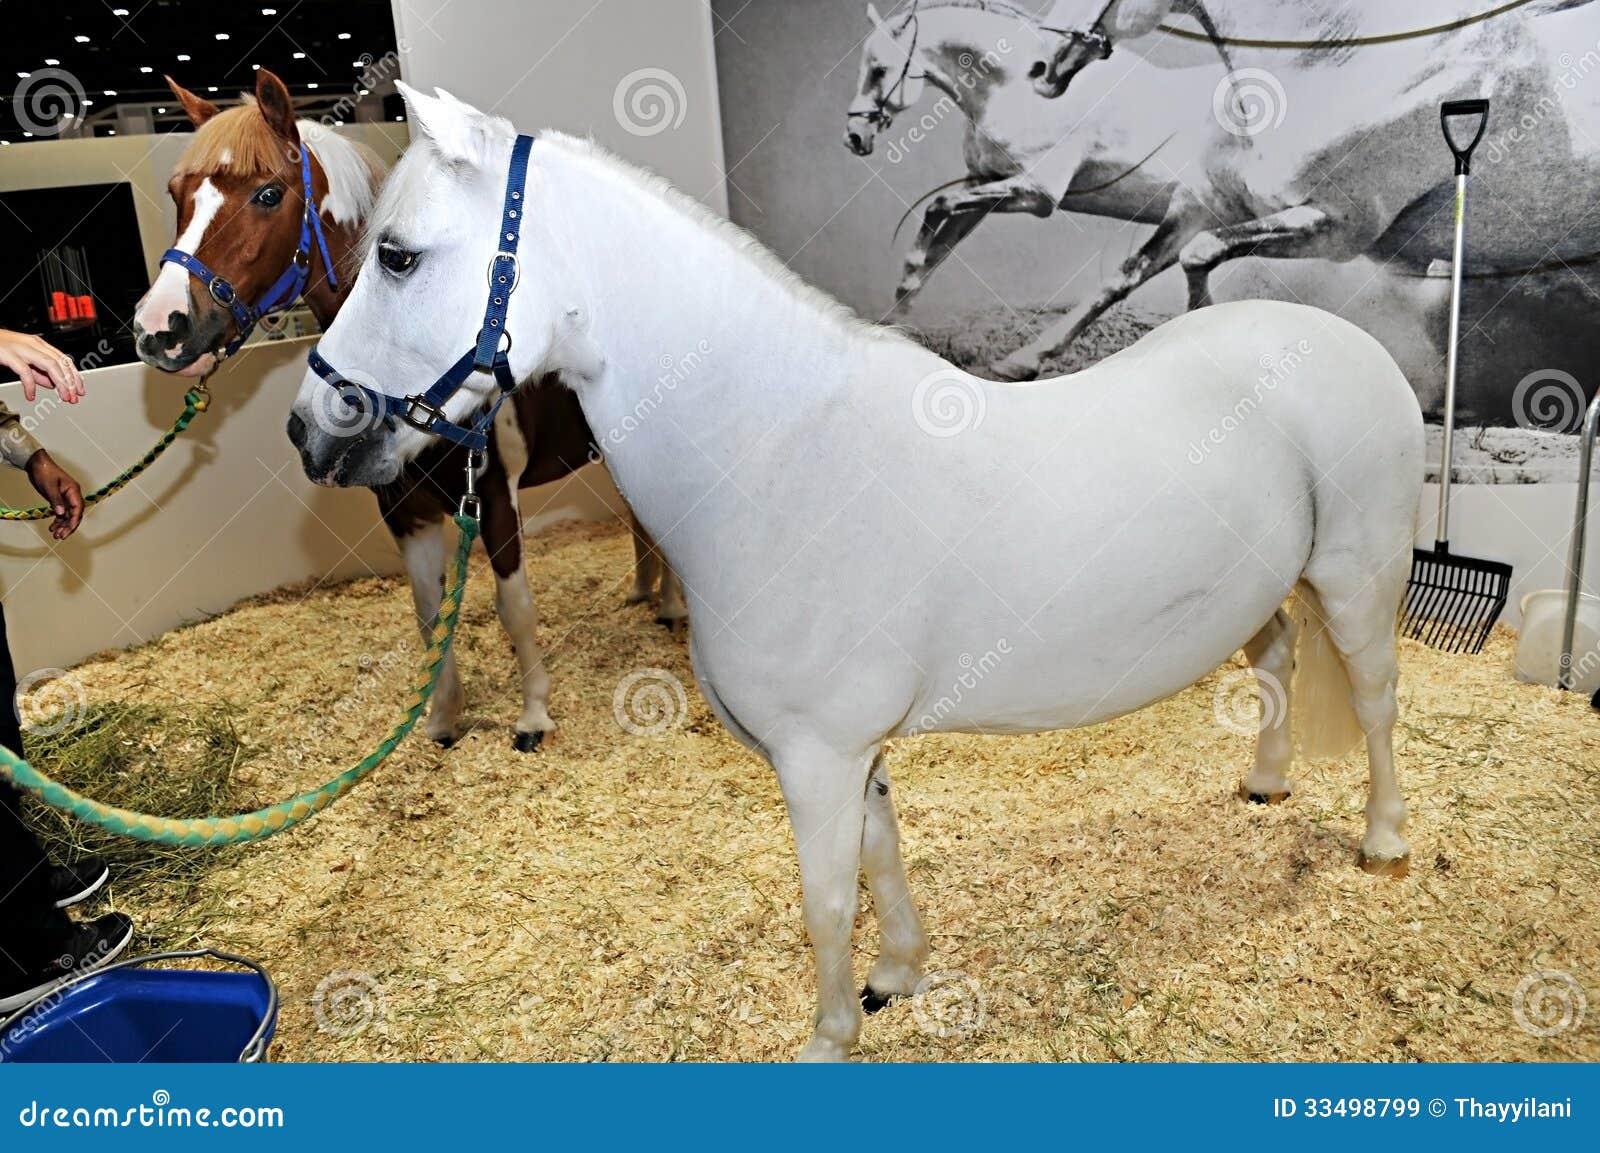 Horse Show At Abu Dhabi International Hunting And